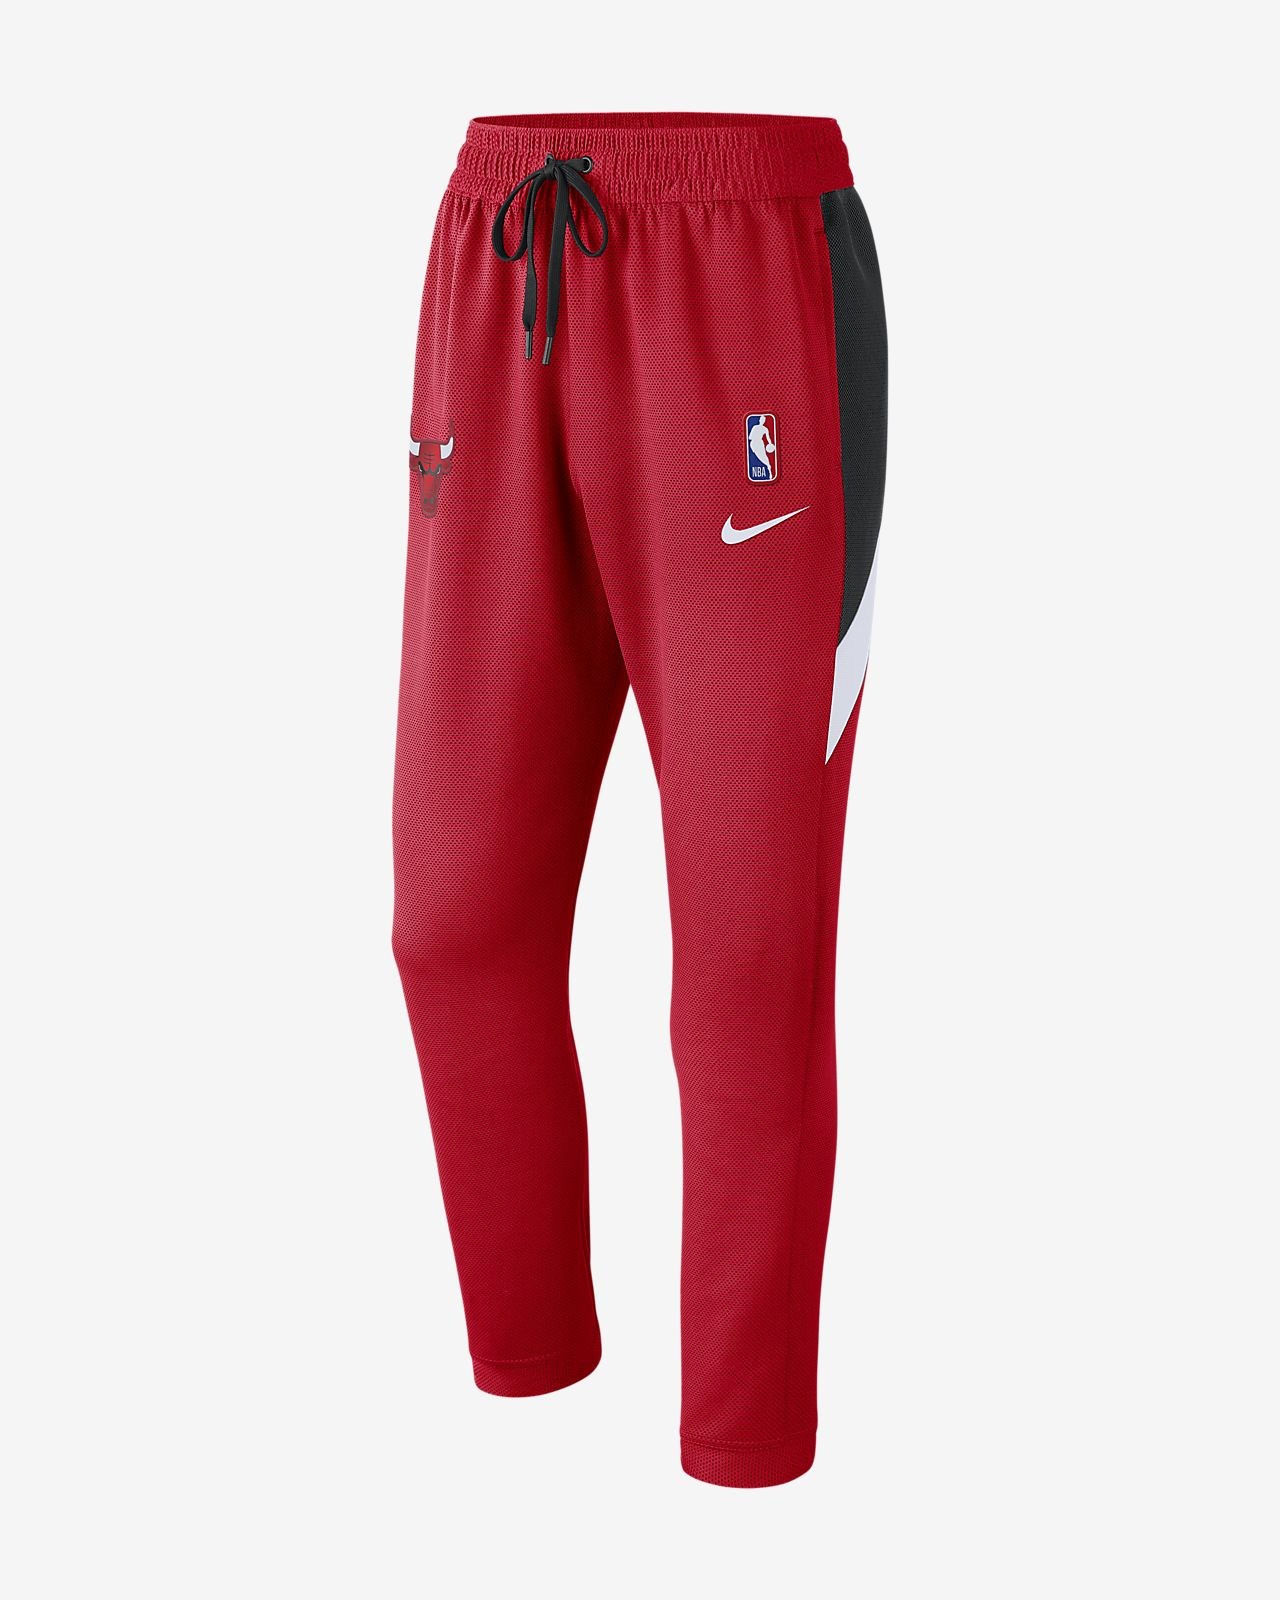 Chicago Bulls Nike Therma Flex Showtime NBA-Herrenhose